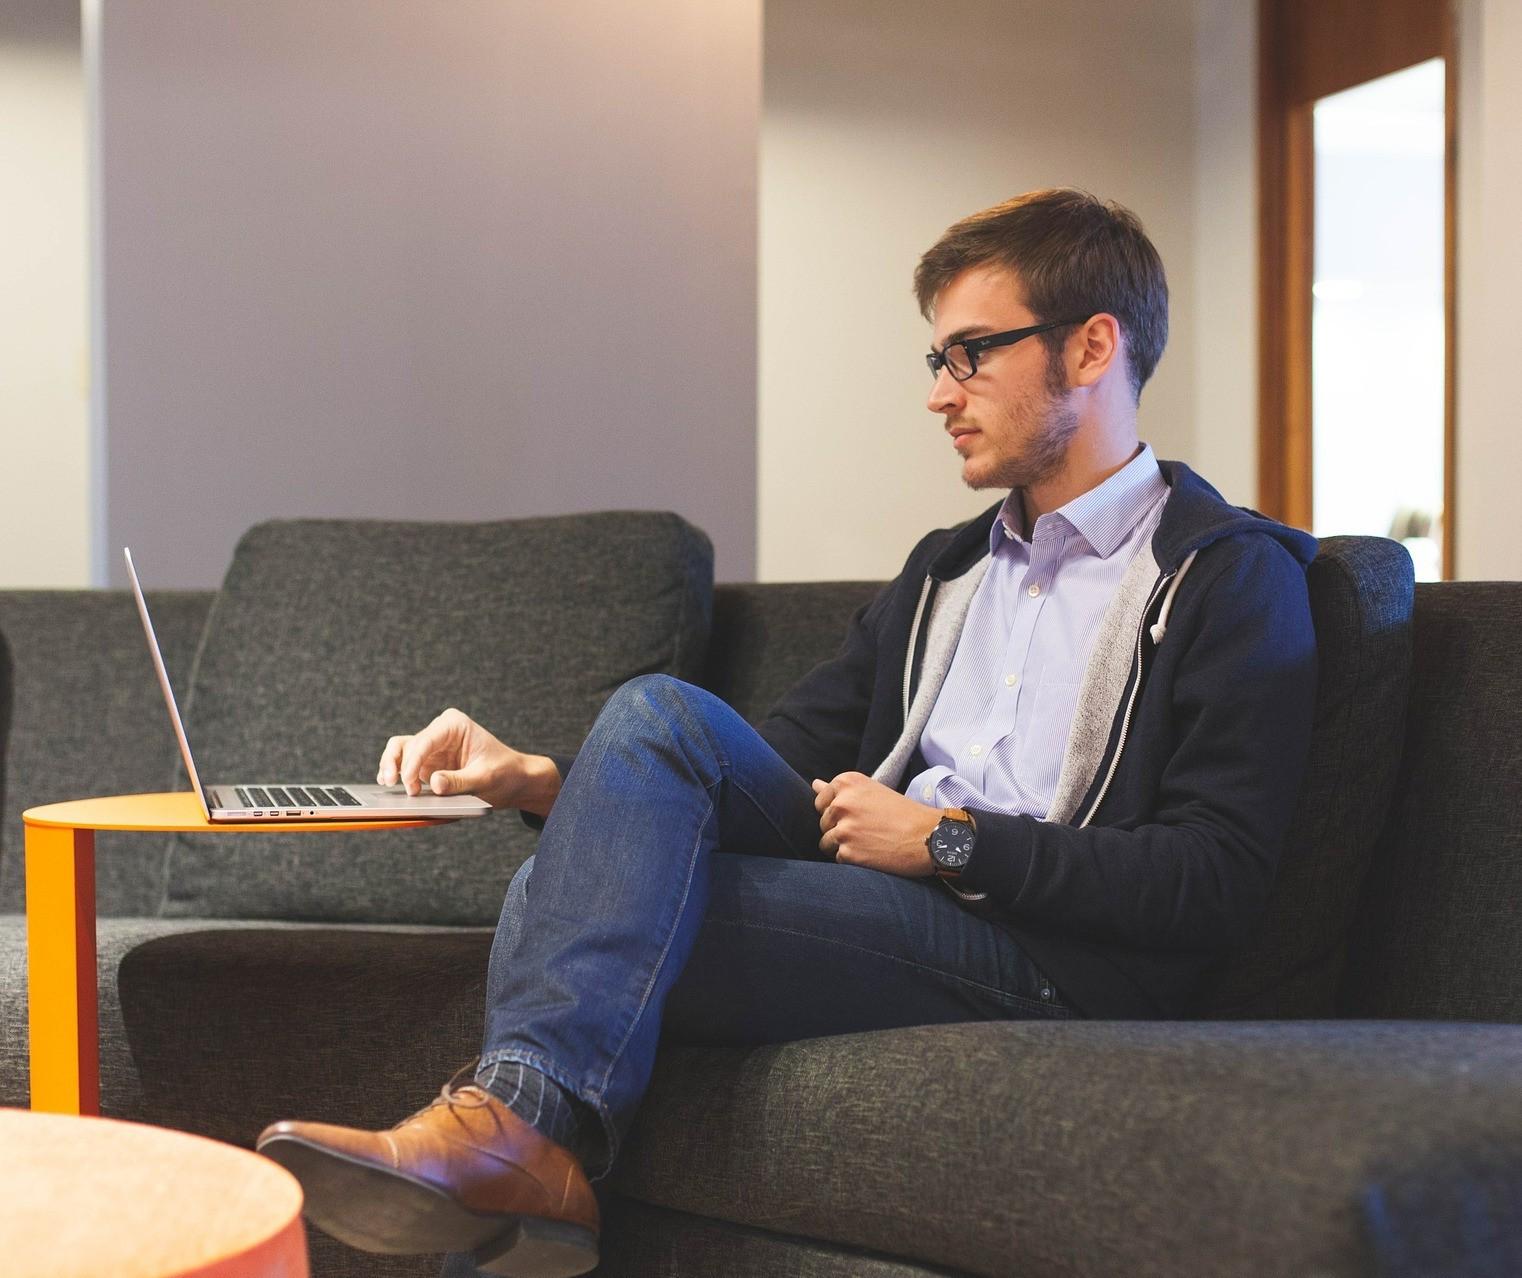 Cultura empresarial precisa se adaptar ao home office